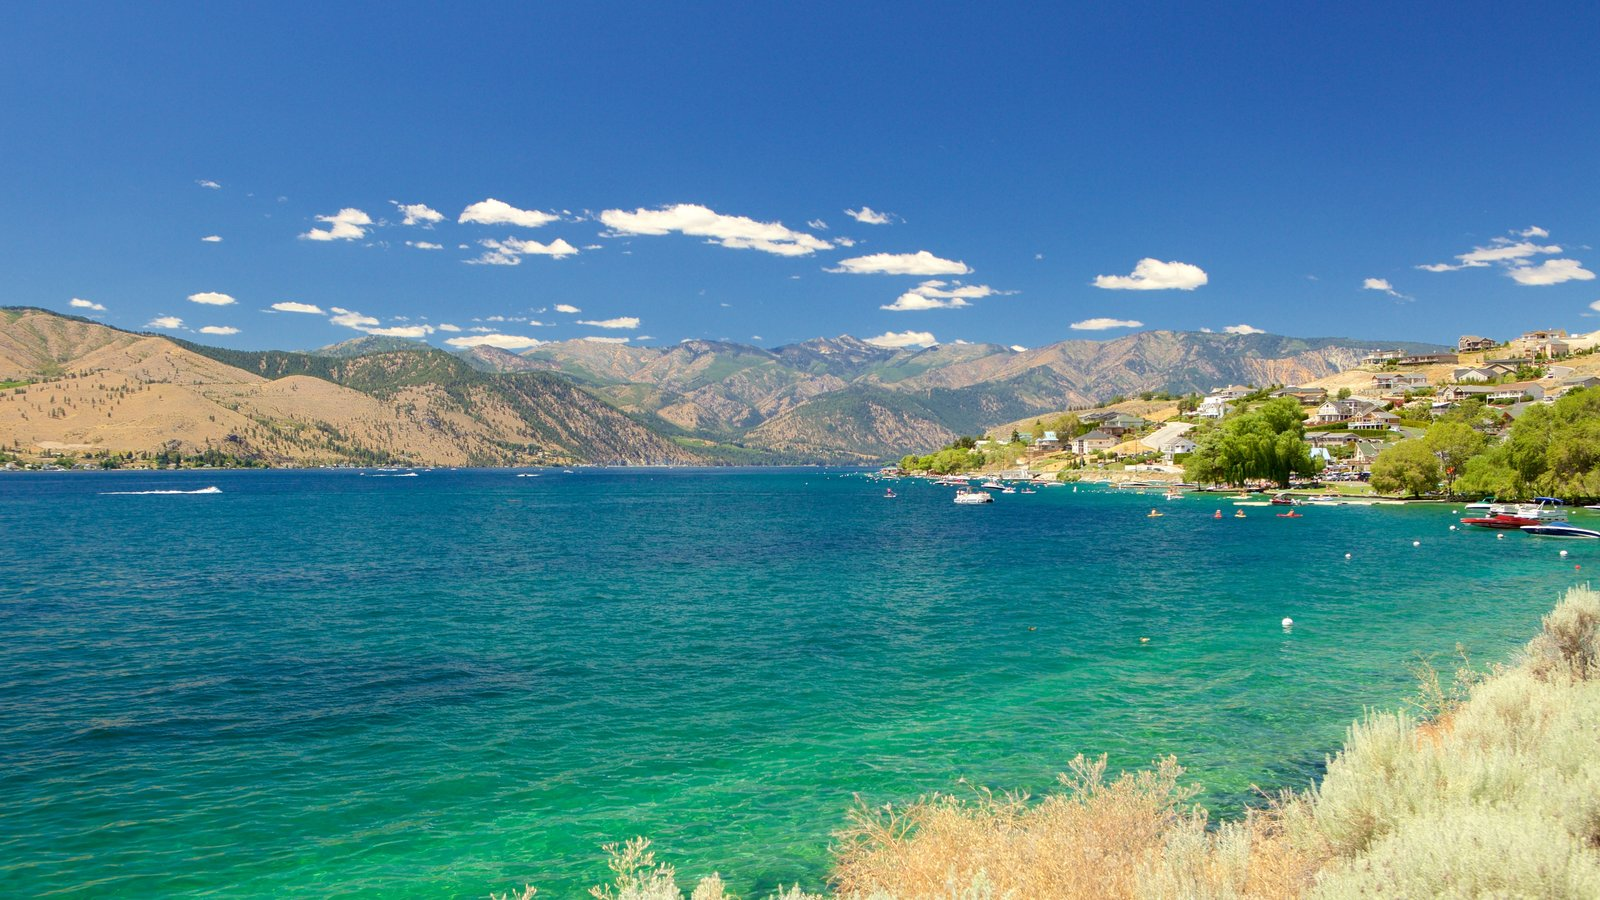 Lake Chelan mostrando paisagens litorâneas